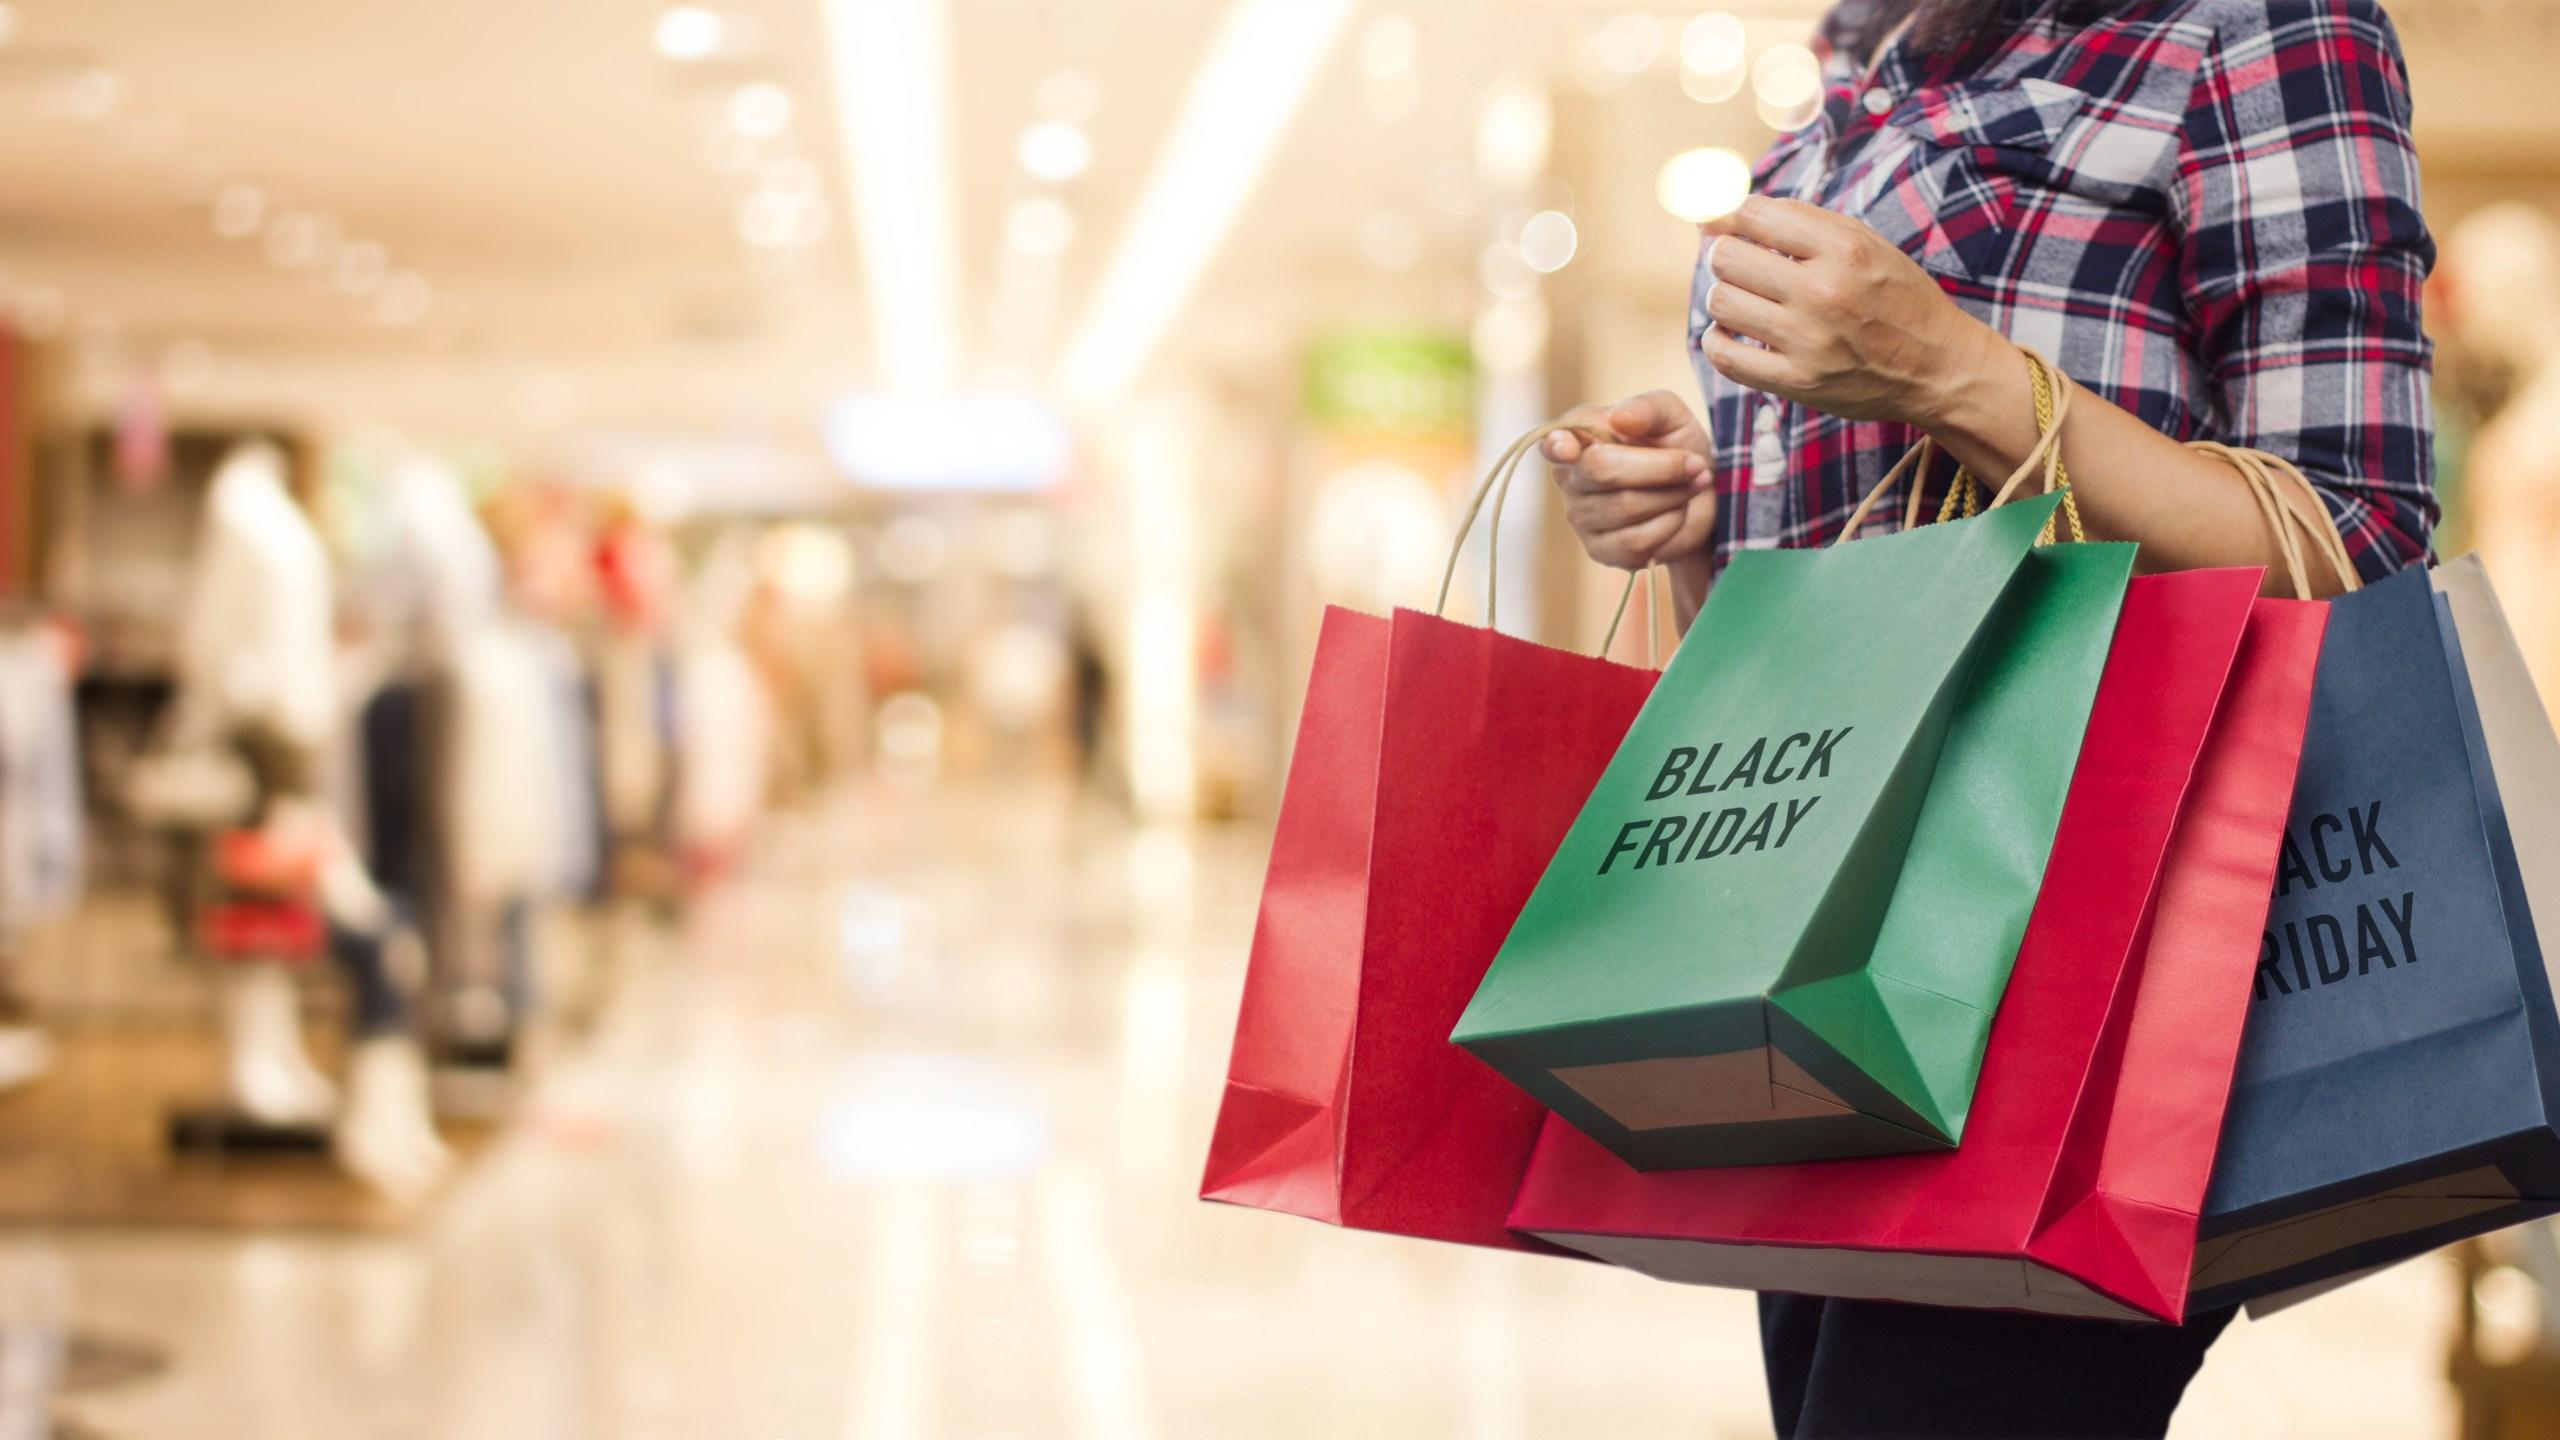 Black friday shopper.